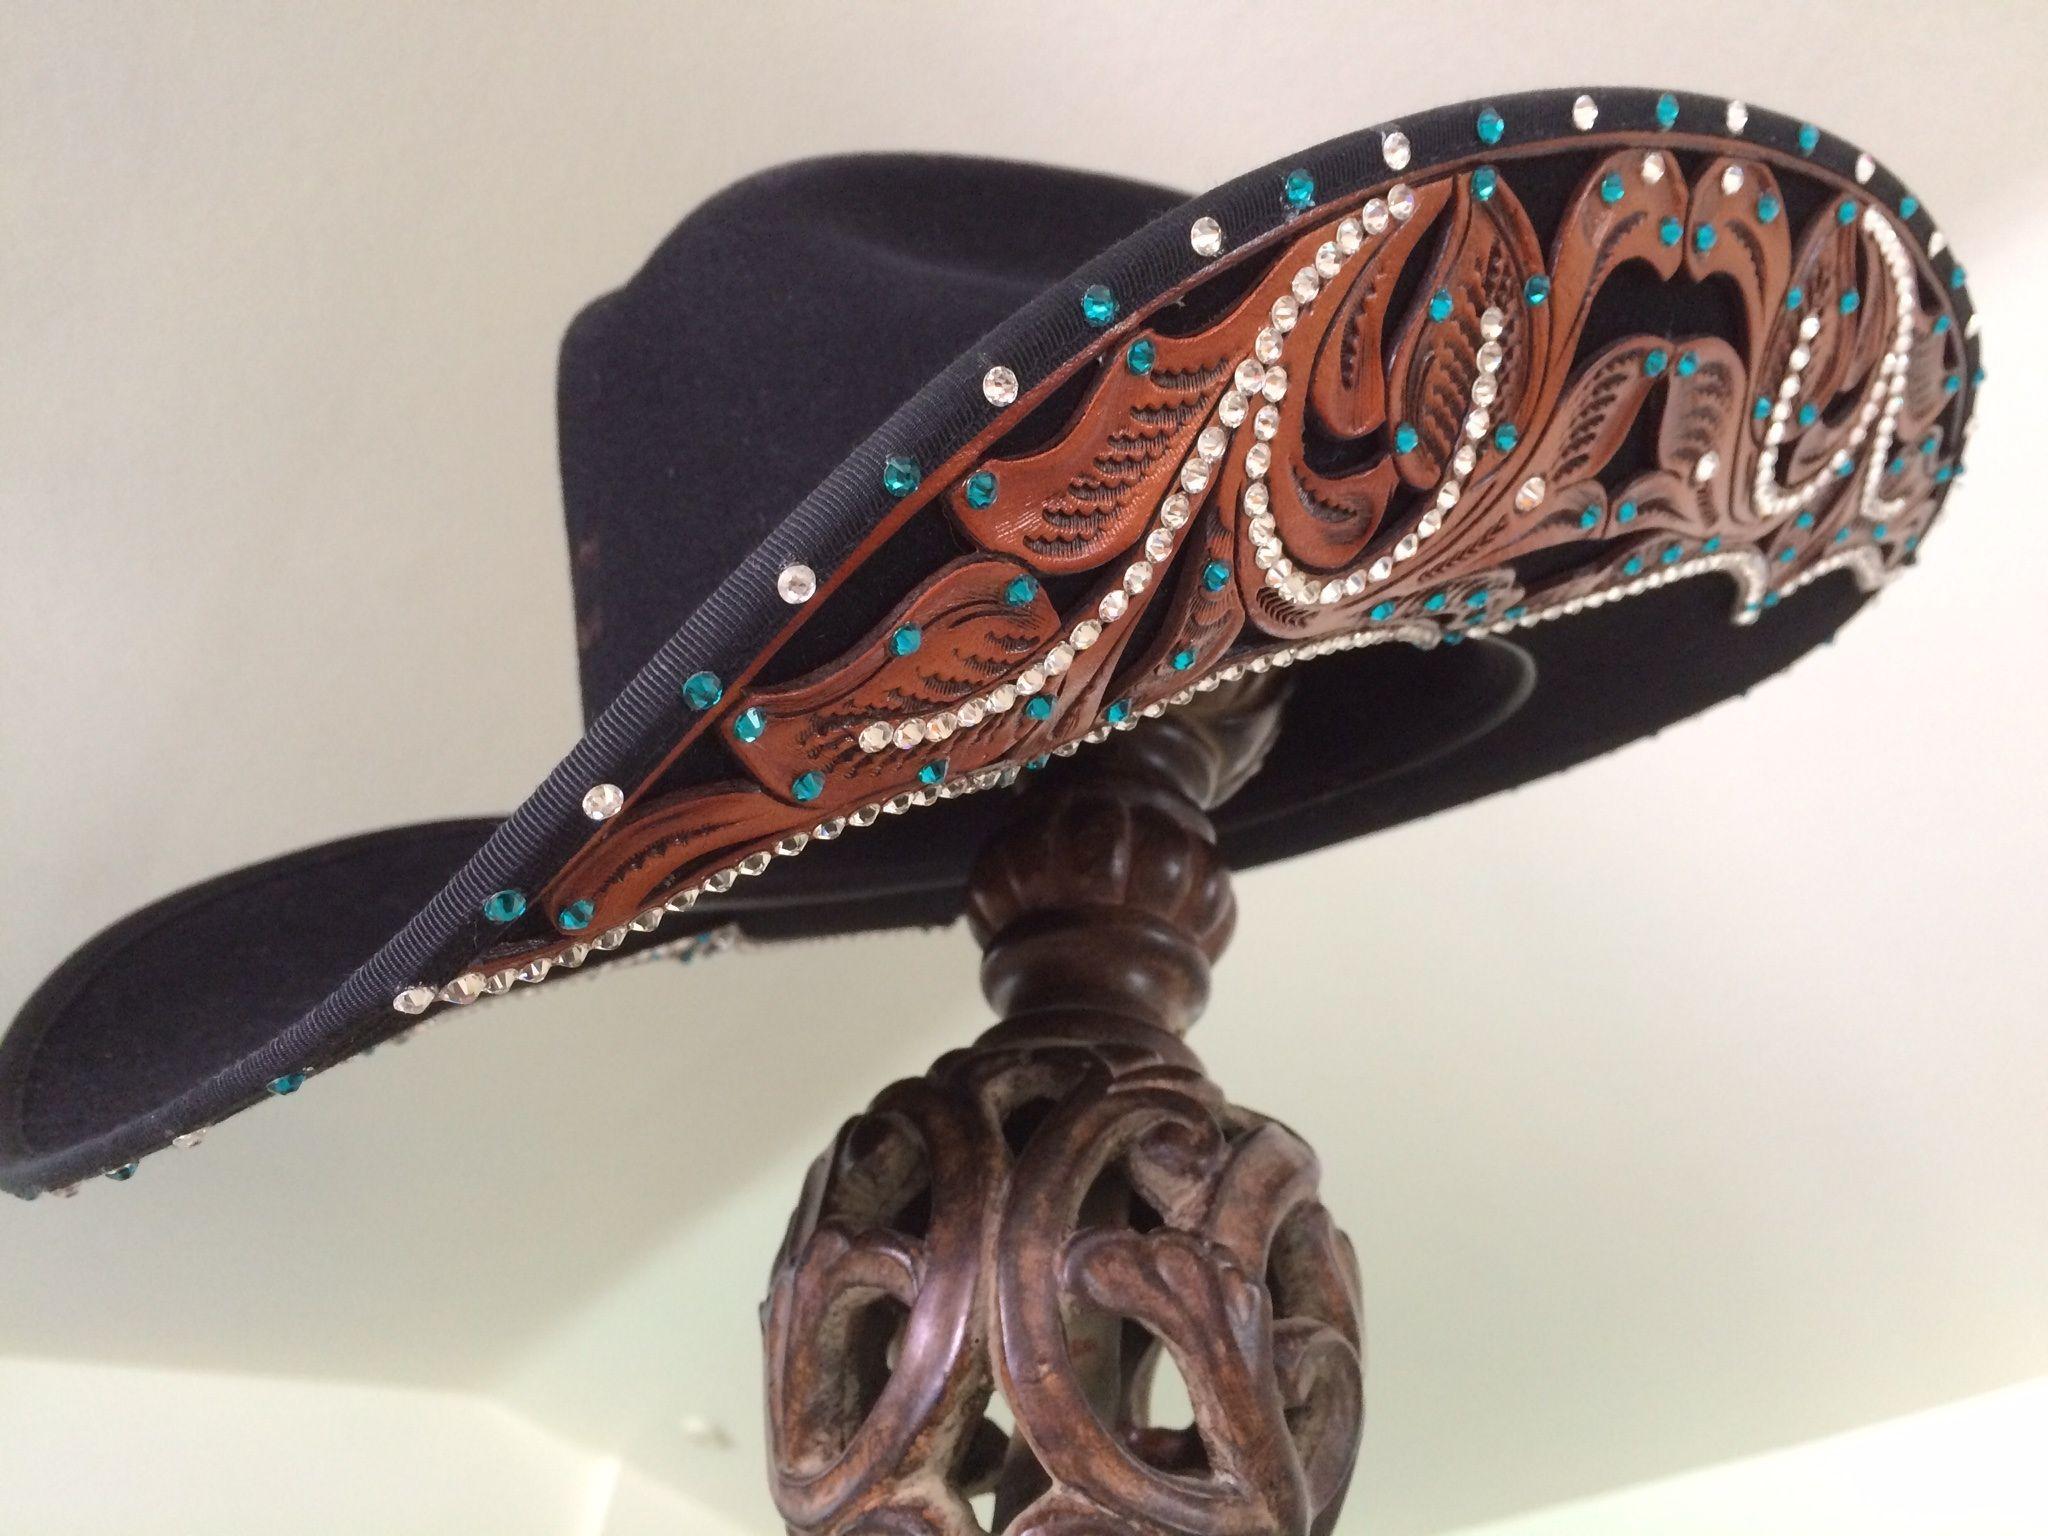 Custom blinged Charlie 1 Horse hat See more at Facebook.com brhats ... d89ee975a72